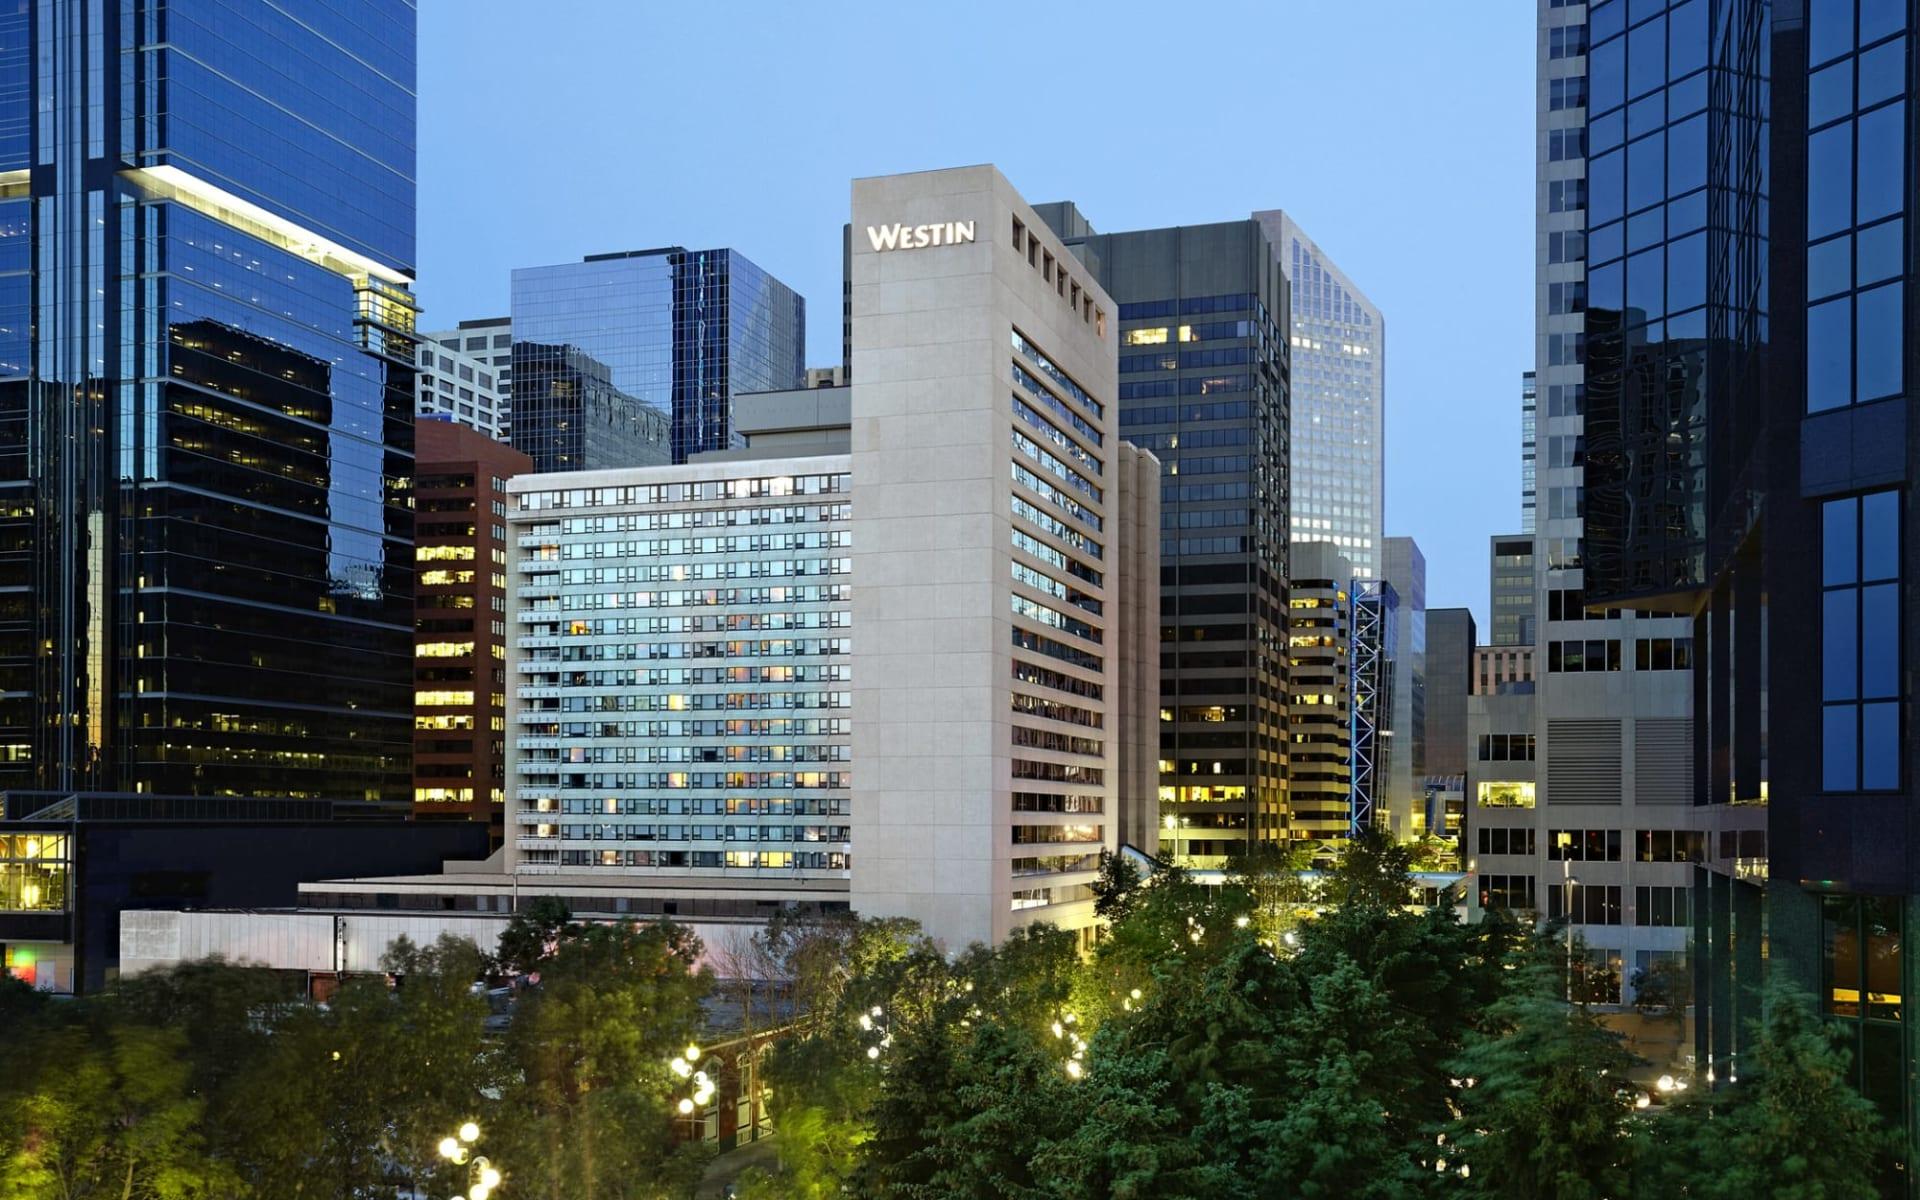 Westin Calgary: Exterior_Westin Calgary_Aussenansicht bei Nacht_Jonview